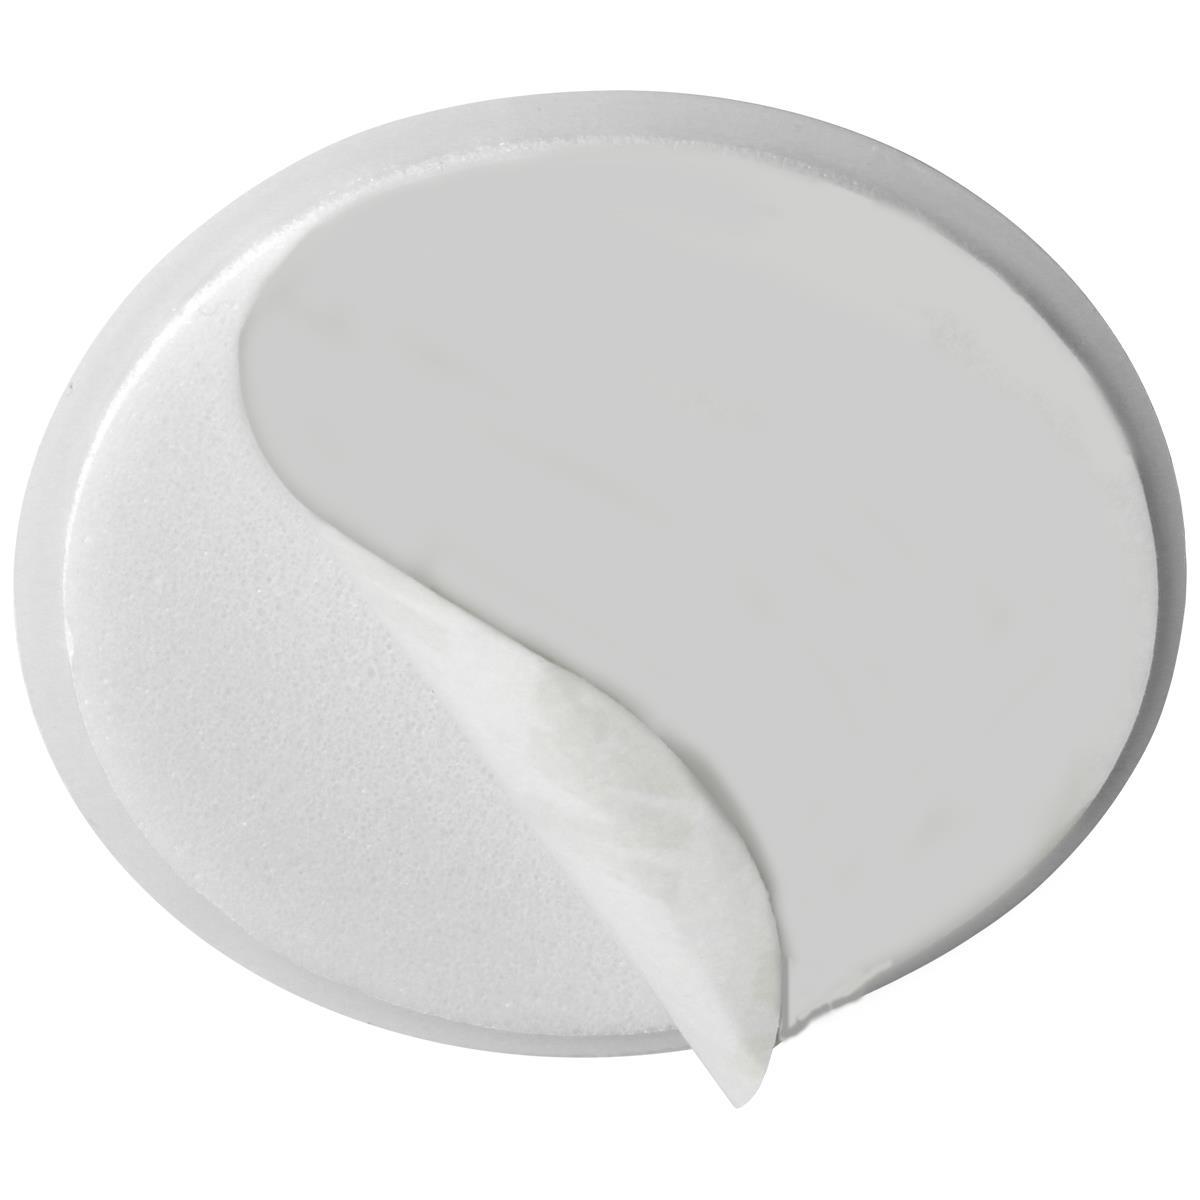 5-x-Wall-Protector-Self-Adhesive-Rubber-Stop-Door-Handle-Bumper-Guard-Stopper miniatuur 5